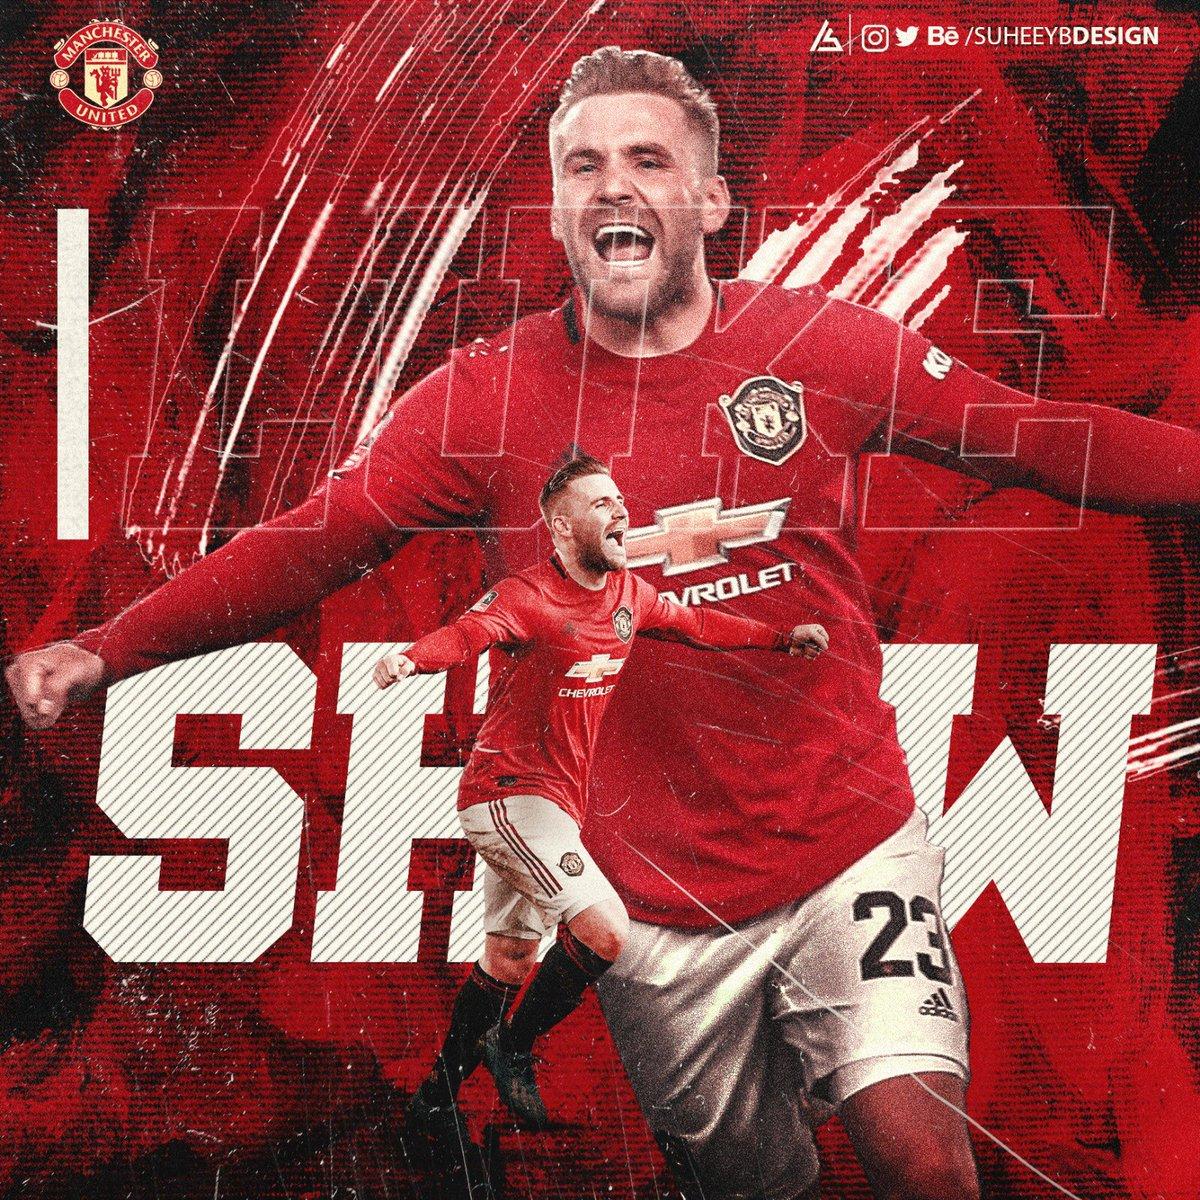 Happy birthday to @LukeShaw23, who turns 25 today! 🔴 #MUFC